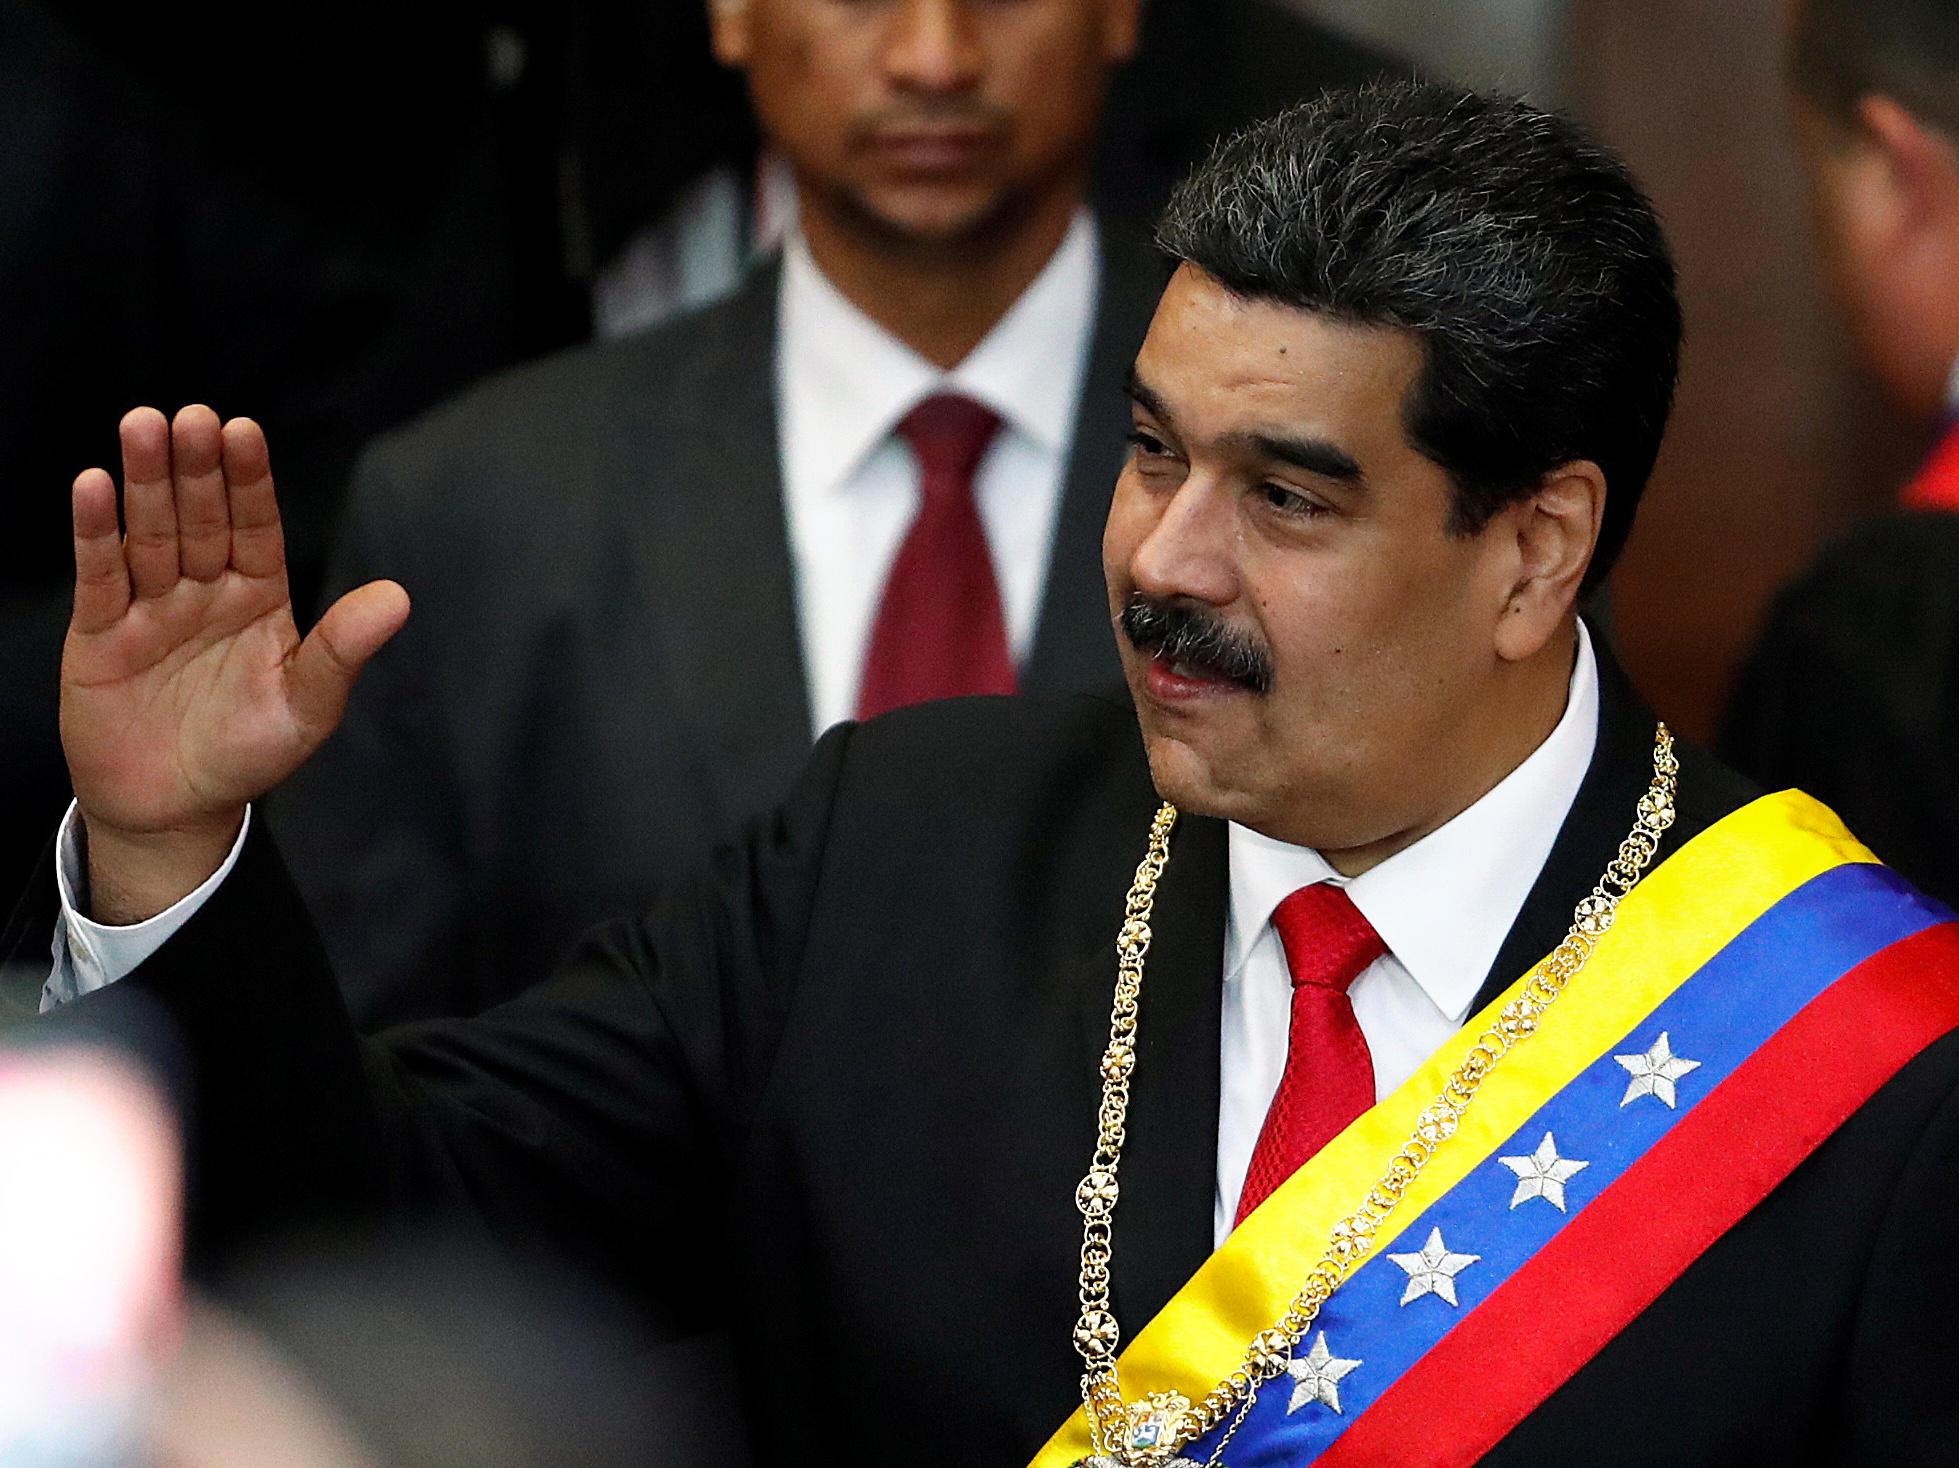 5 Reasons Why Trump's Venezuela Embargo Won't End the Maduro Regime